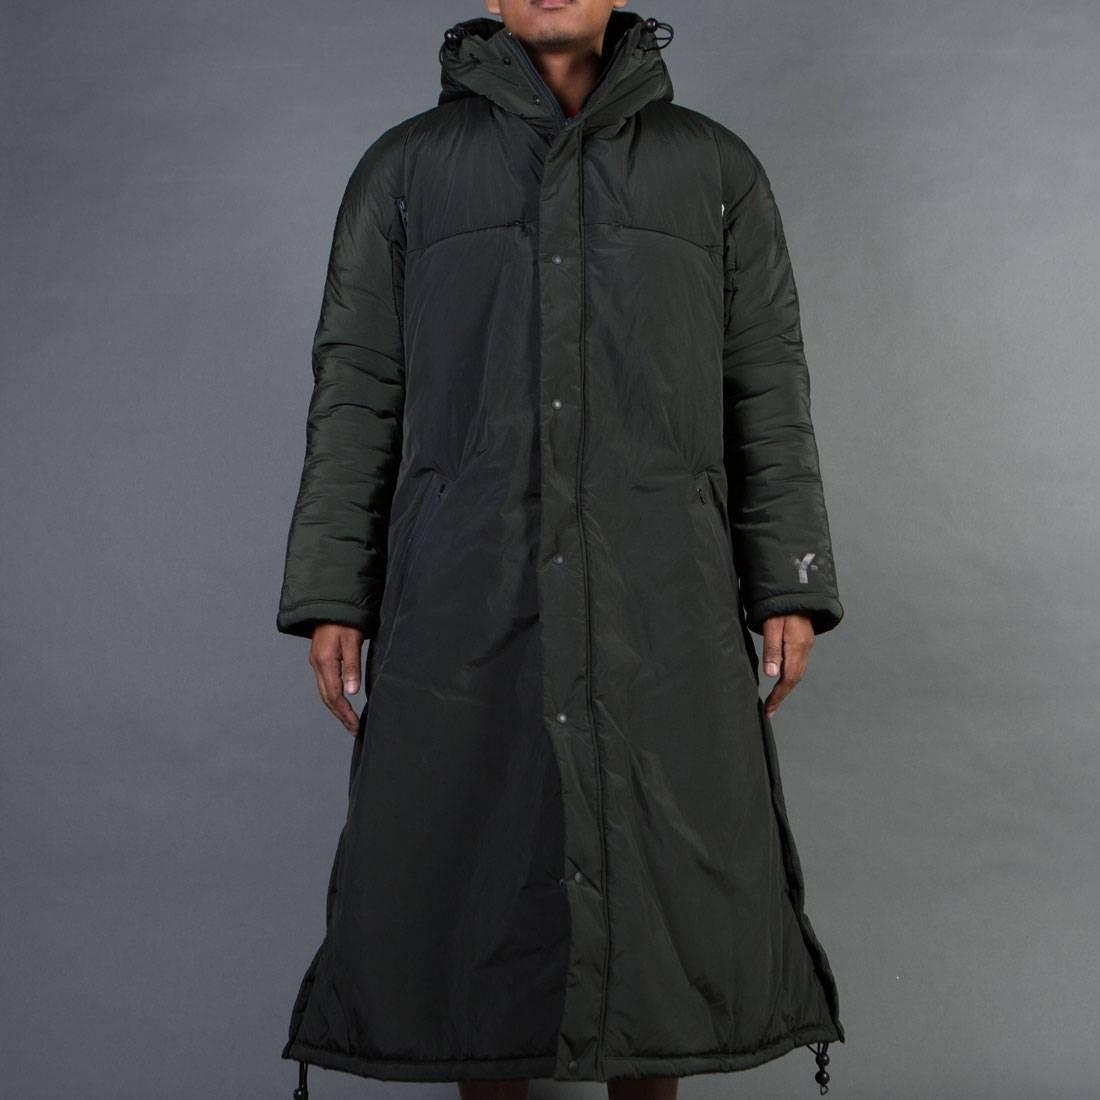 Adidas Y-3 Men Nylon PA Coat (olive / dark black olive)